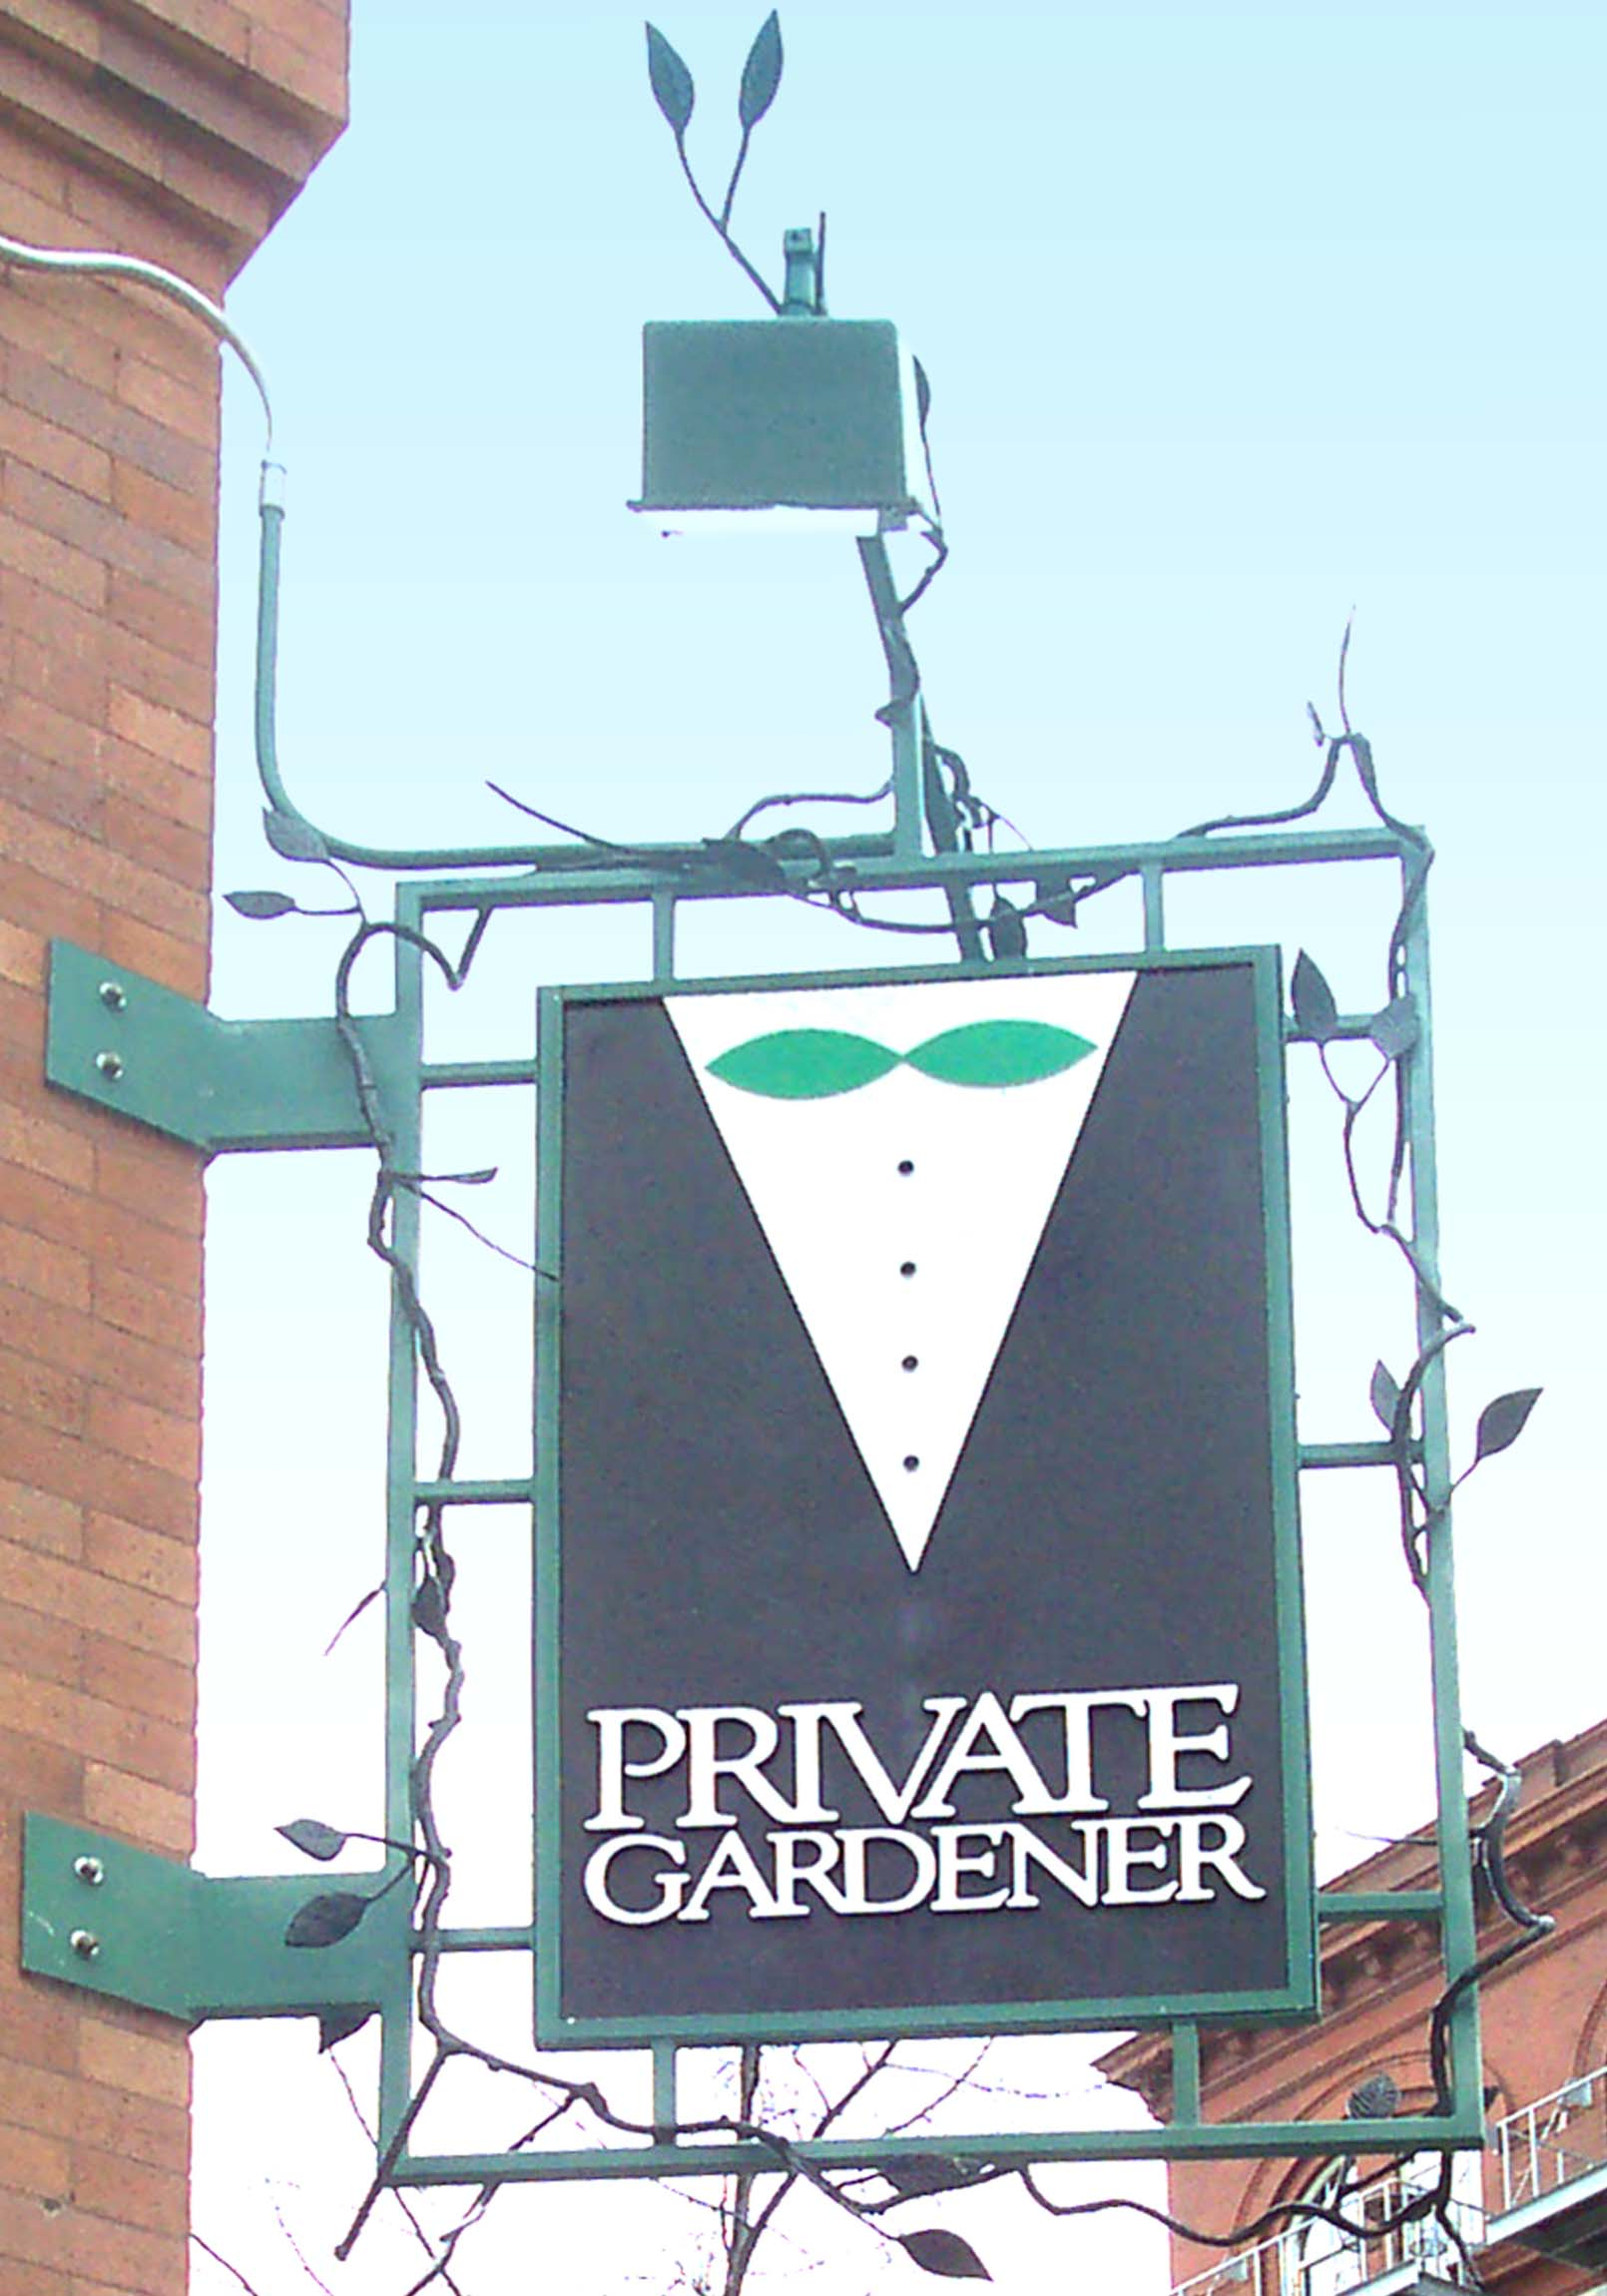 Private Gardener